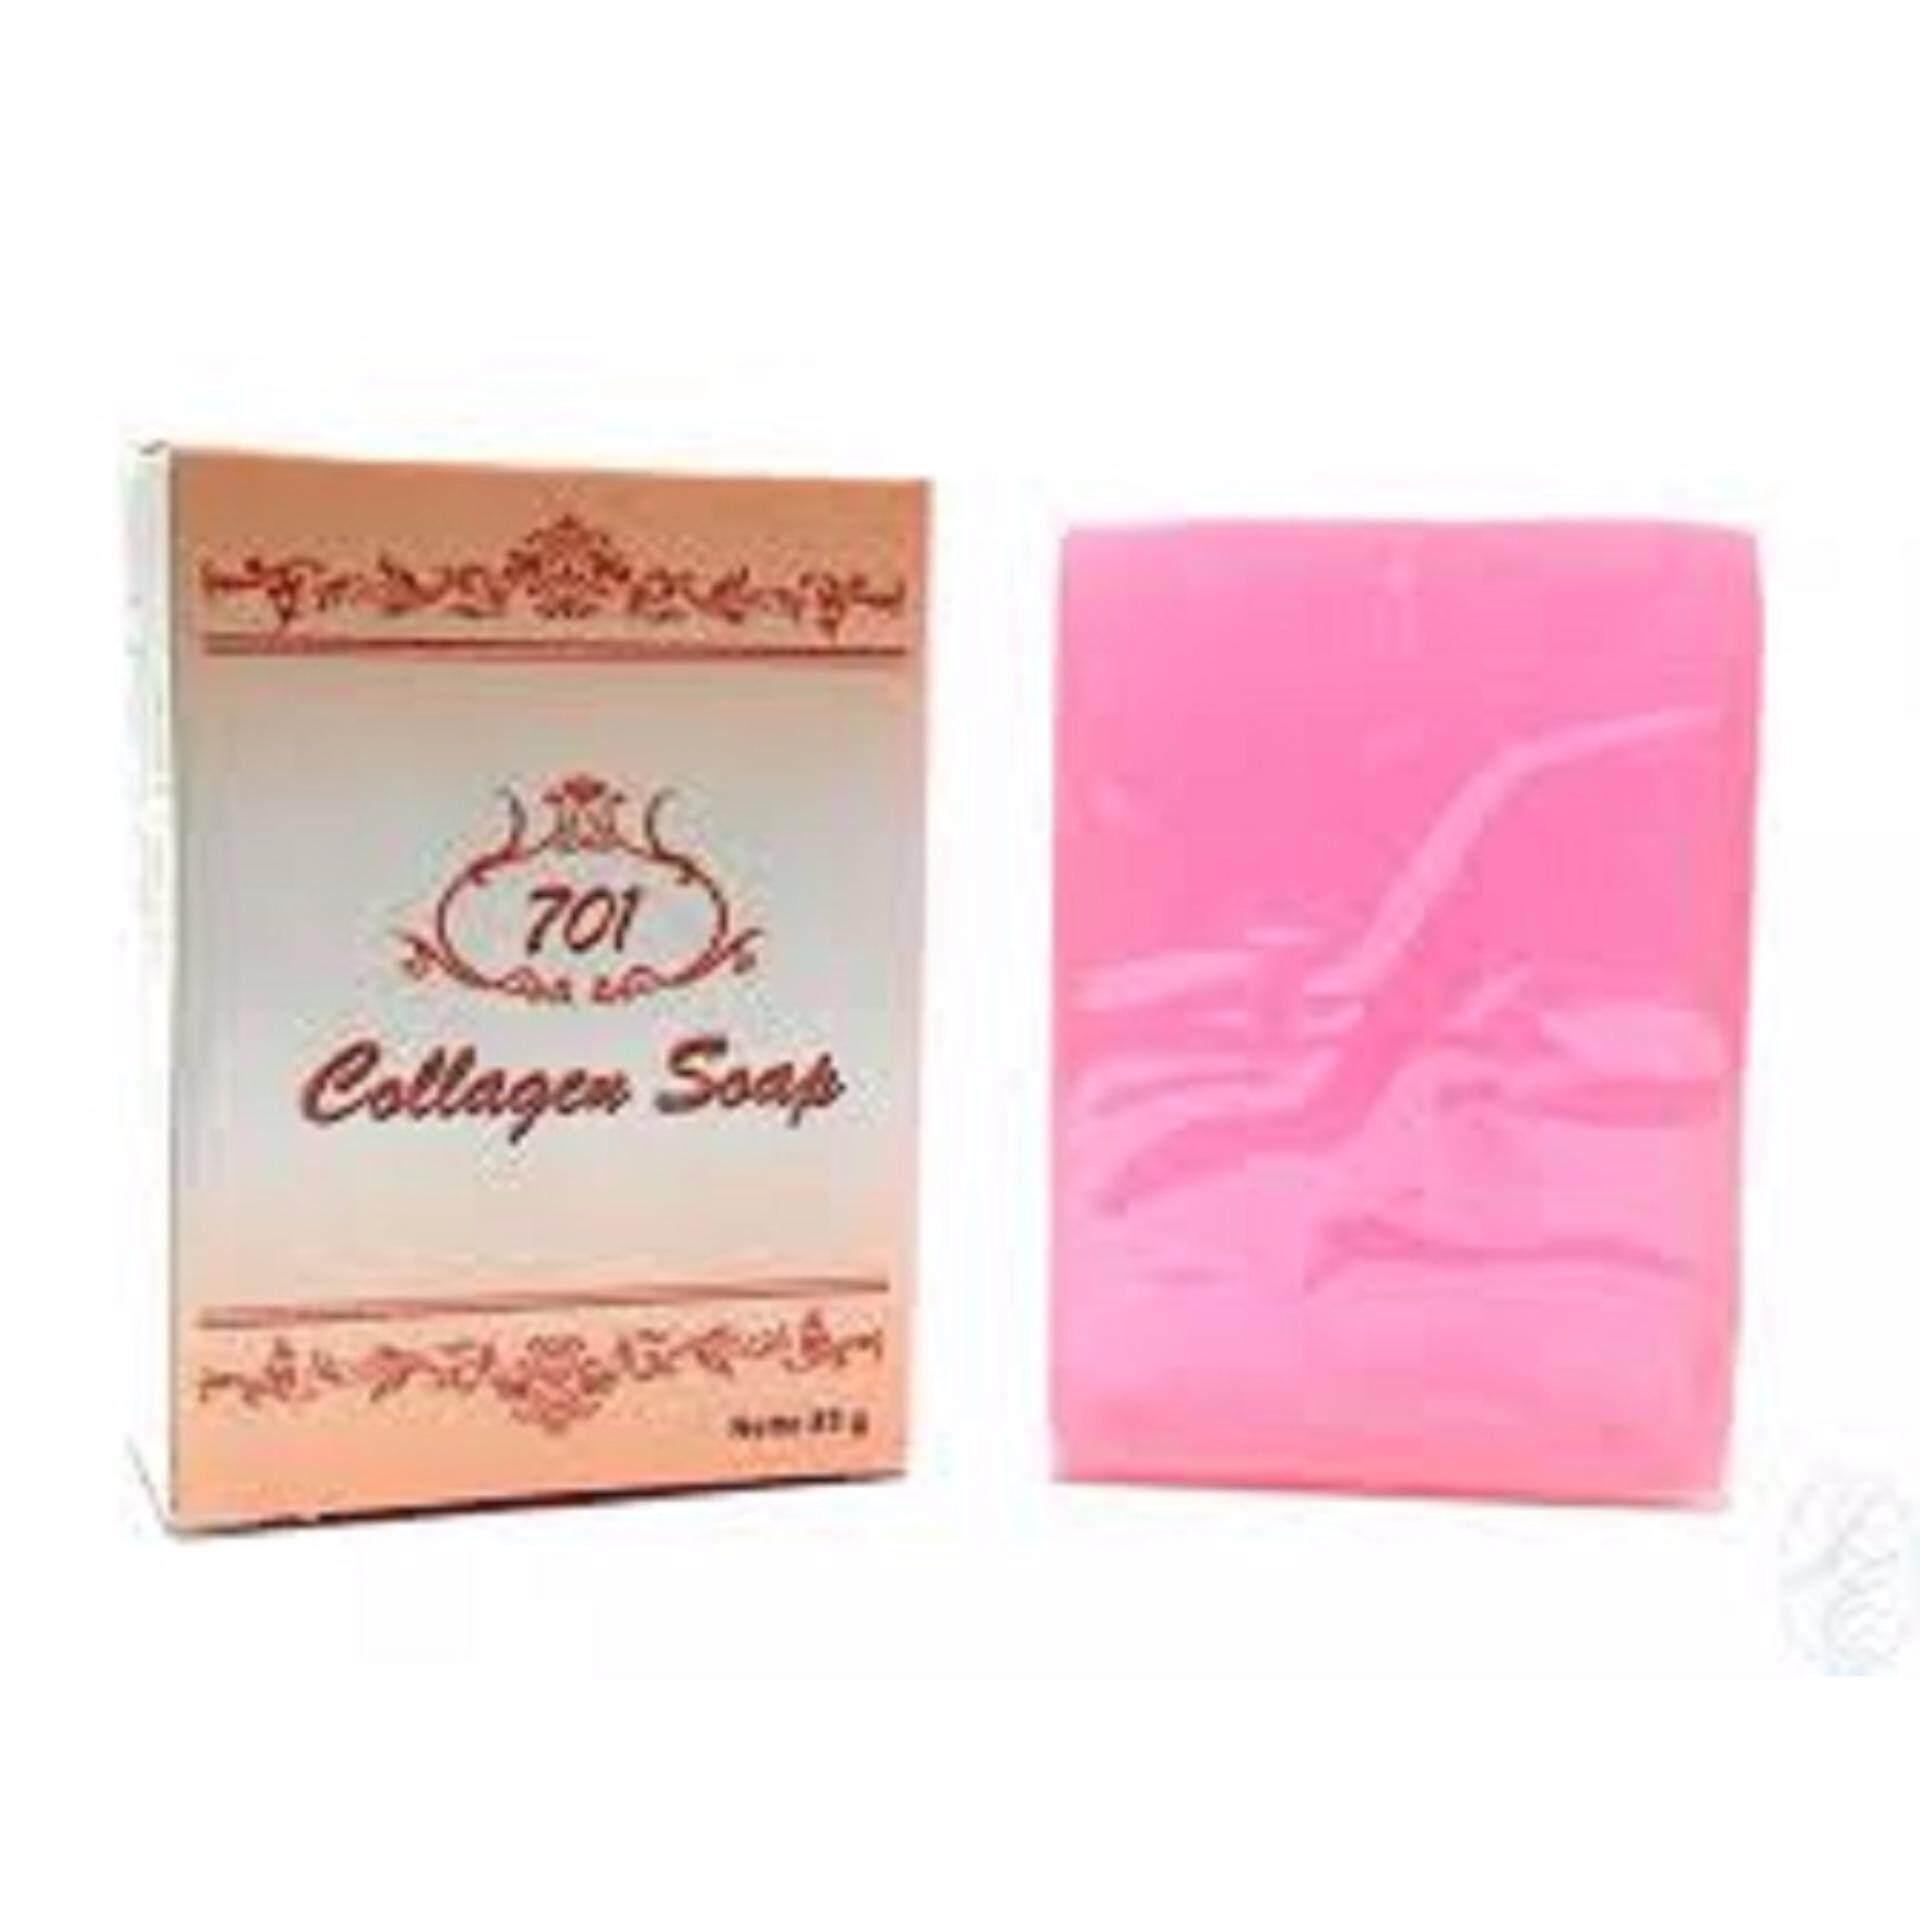 Collagen set Whitening Beauty